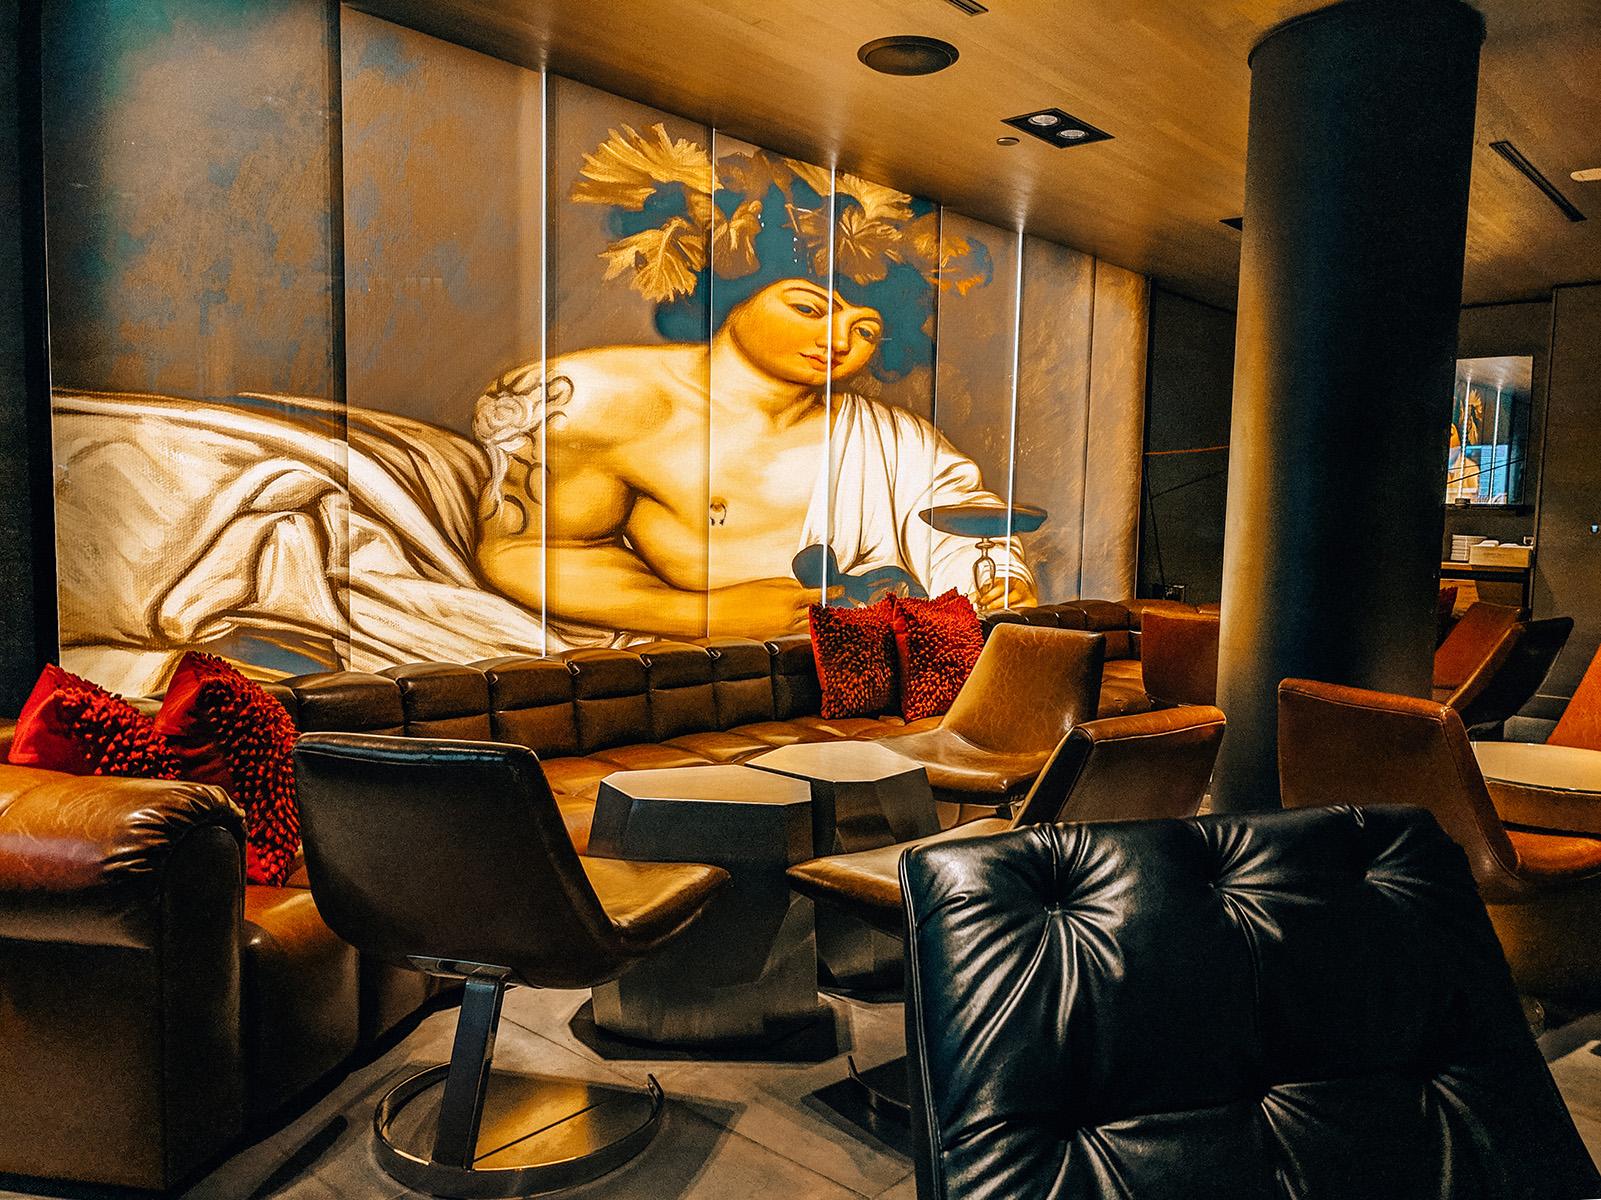 Hotel Vintage lobby lounge